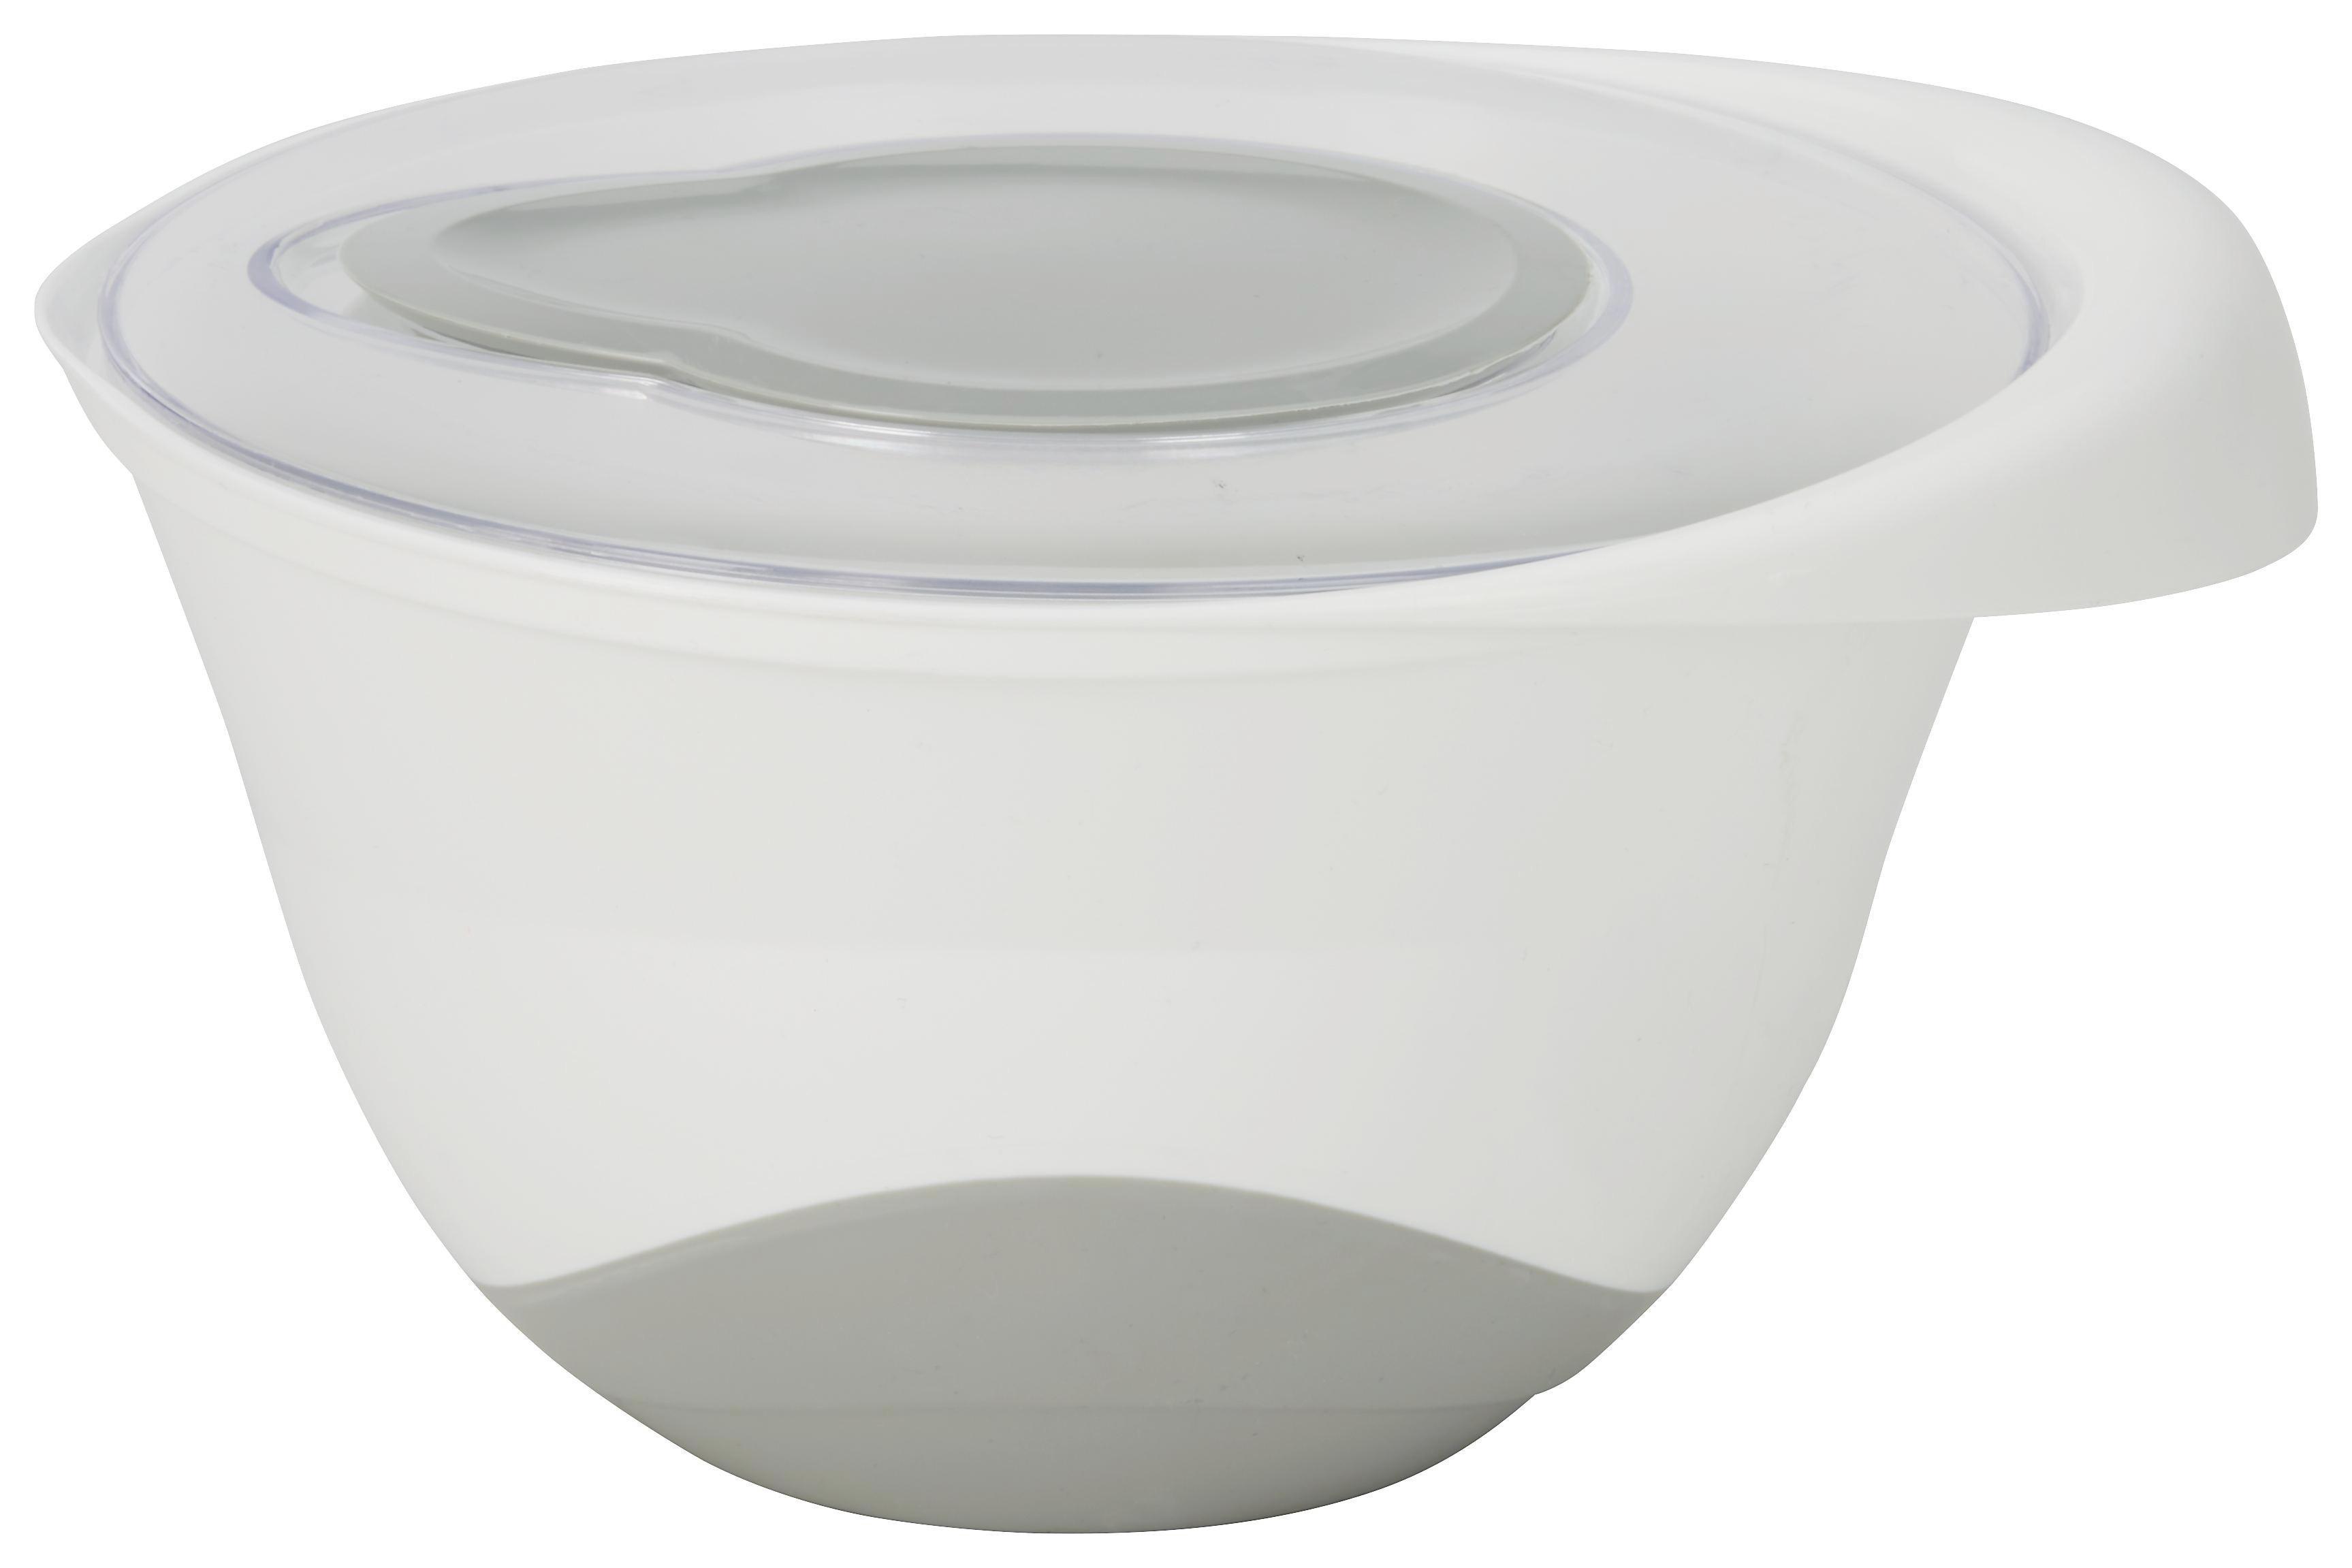 Rührschüssel Rory in Weiß/Grau - Weiß/Grau, Kunststoff (23,5/13cm) - MÖMAX modern living